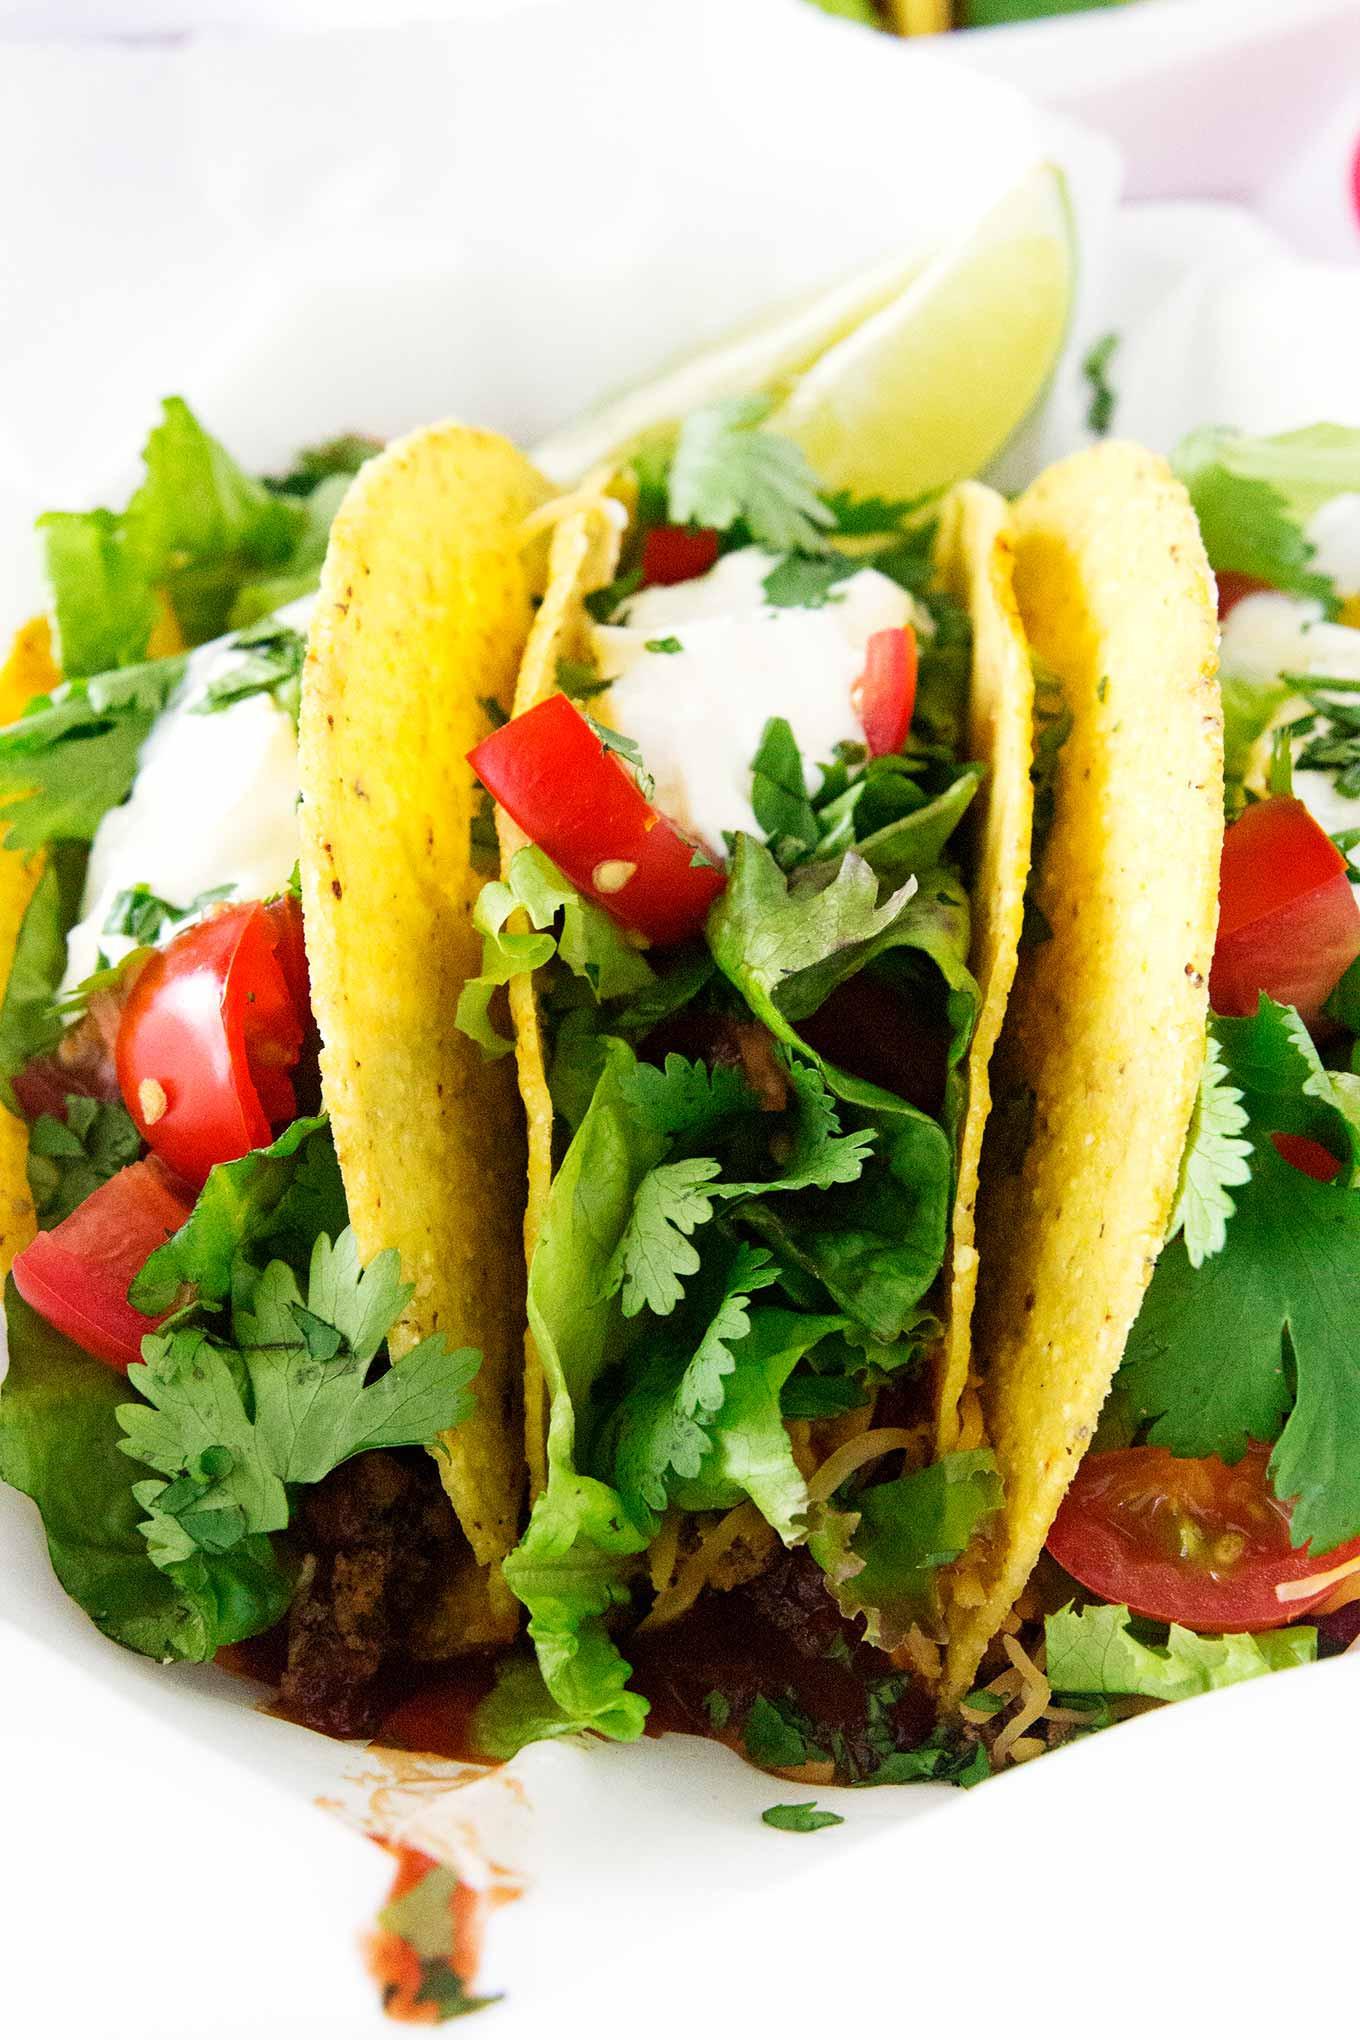 Ground Beef Taco Recipe  The Best Ground Beef Tacos Recipe • So Damn Delish